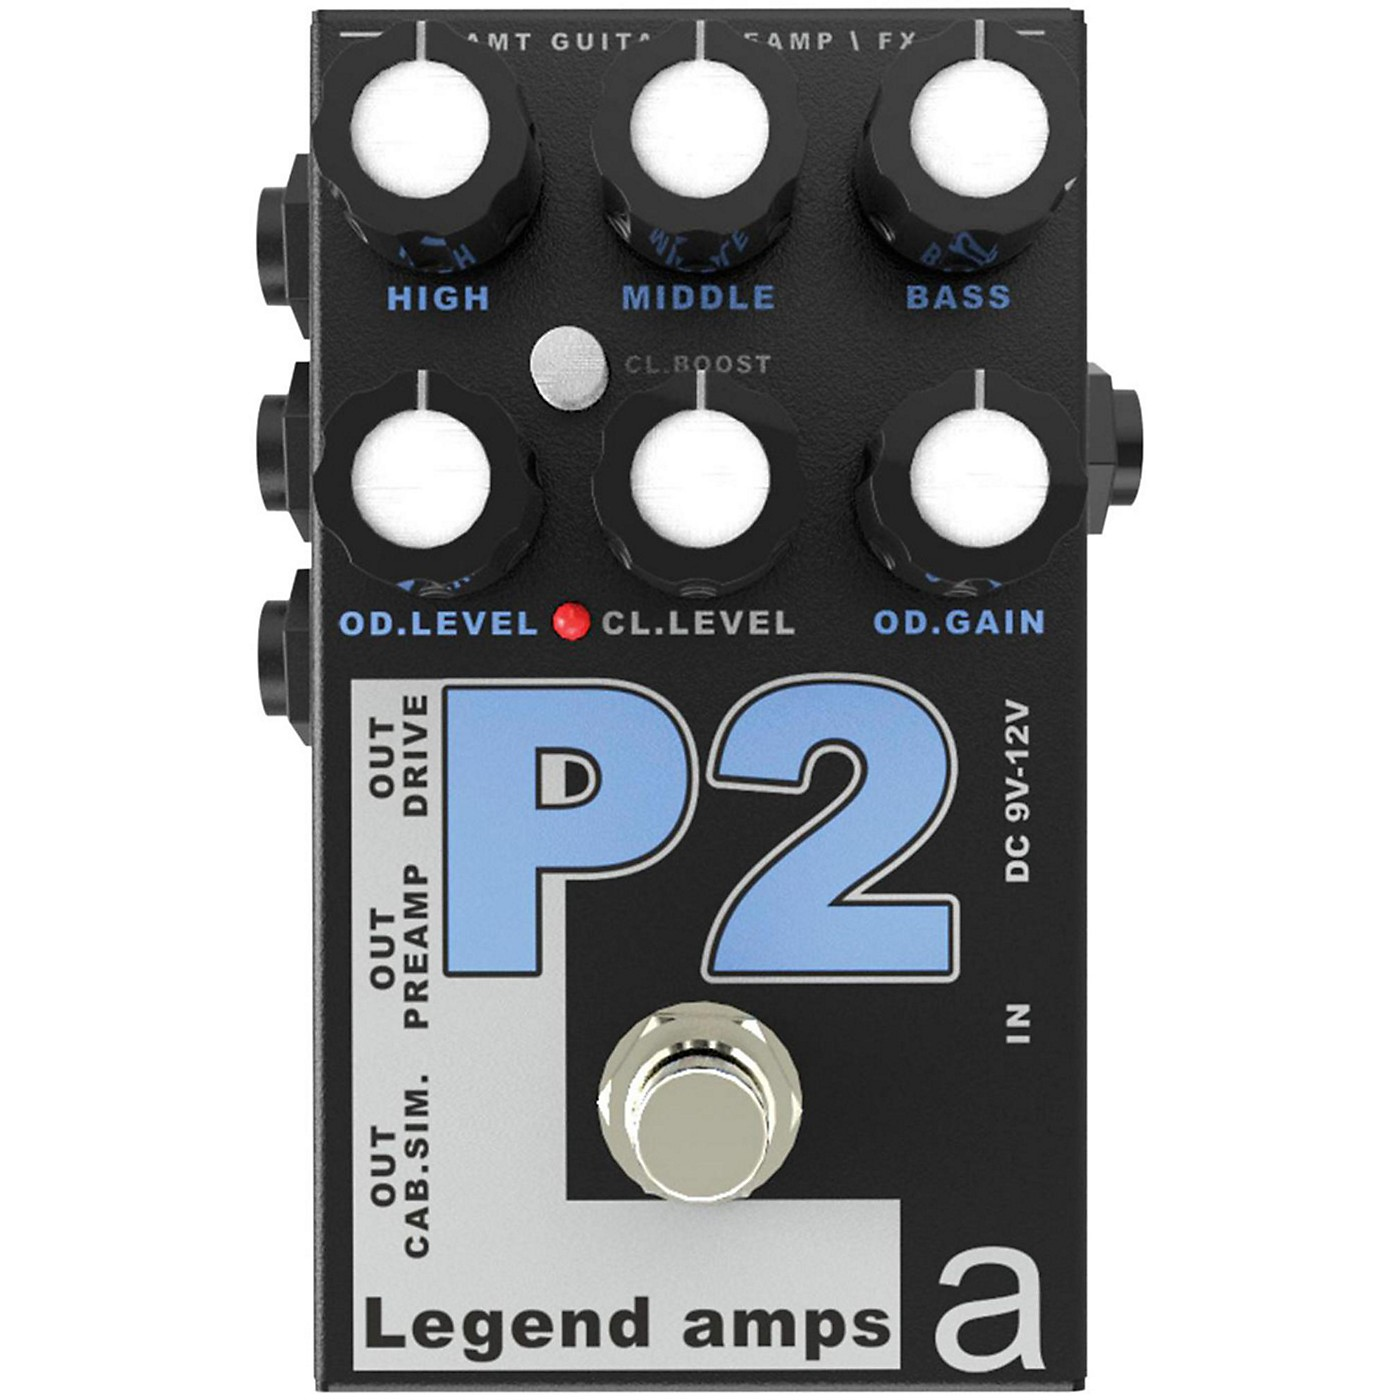 AMT Electronics Legend Amp Series II P2 thumbnail